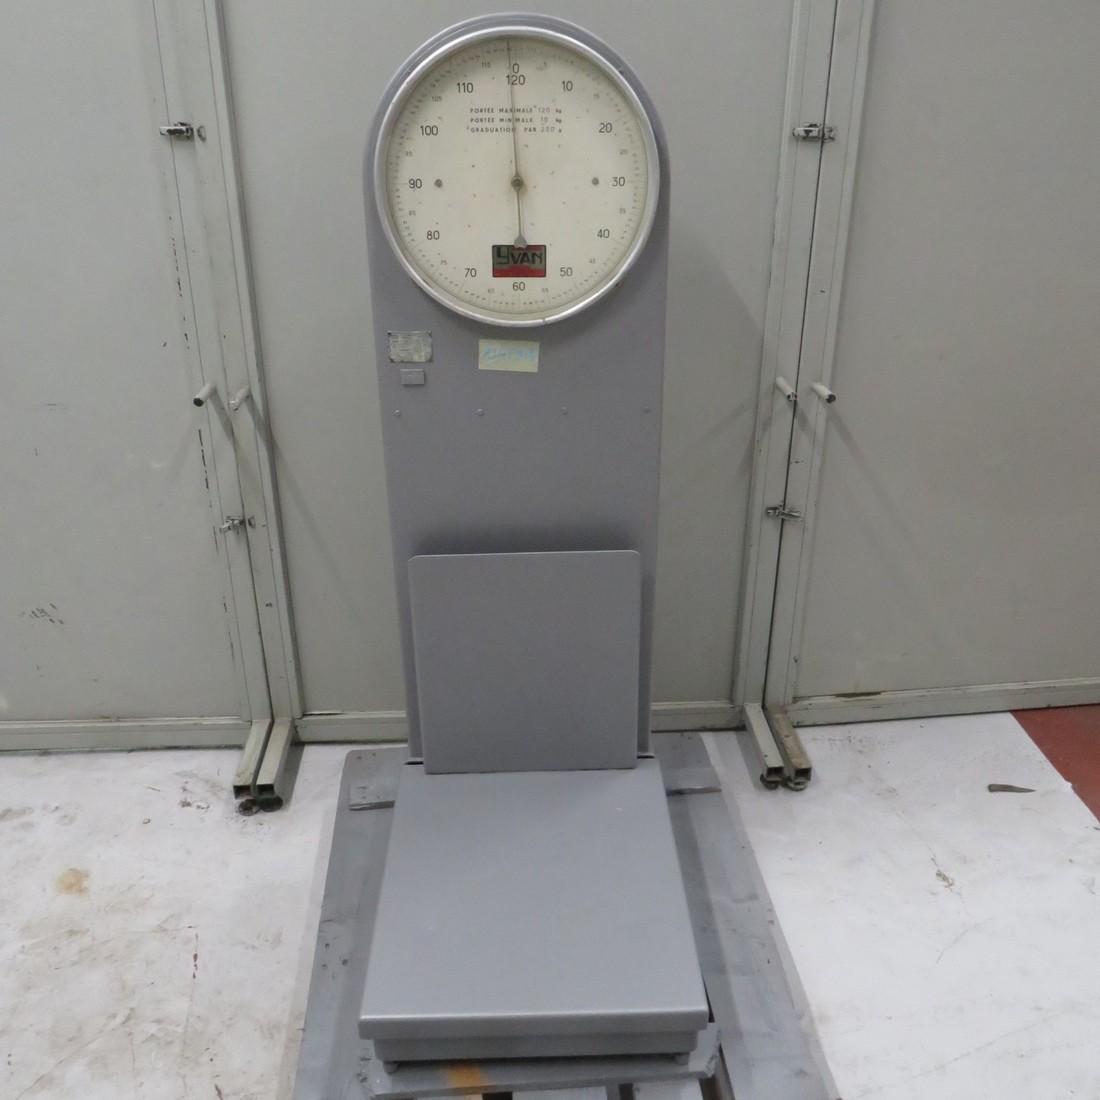 R14T915 YVAN weighing equipment